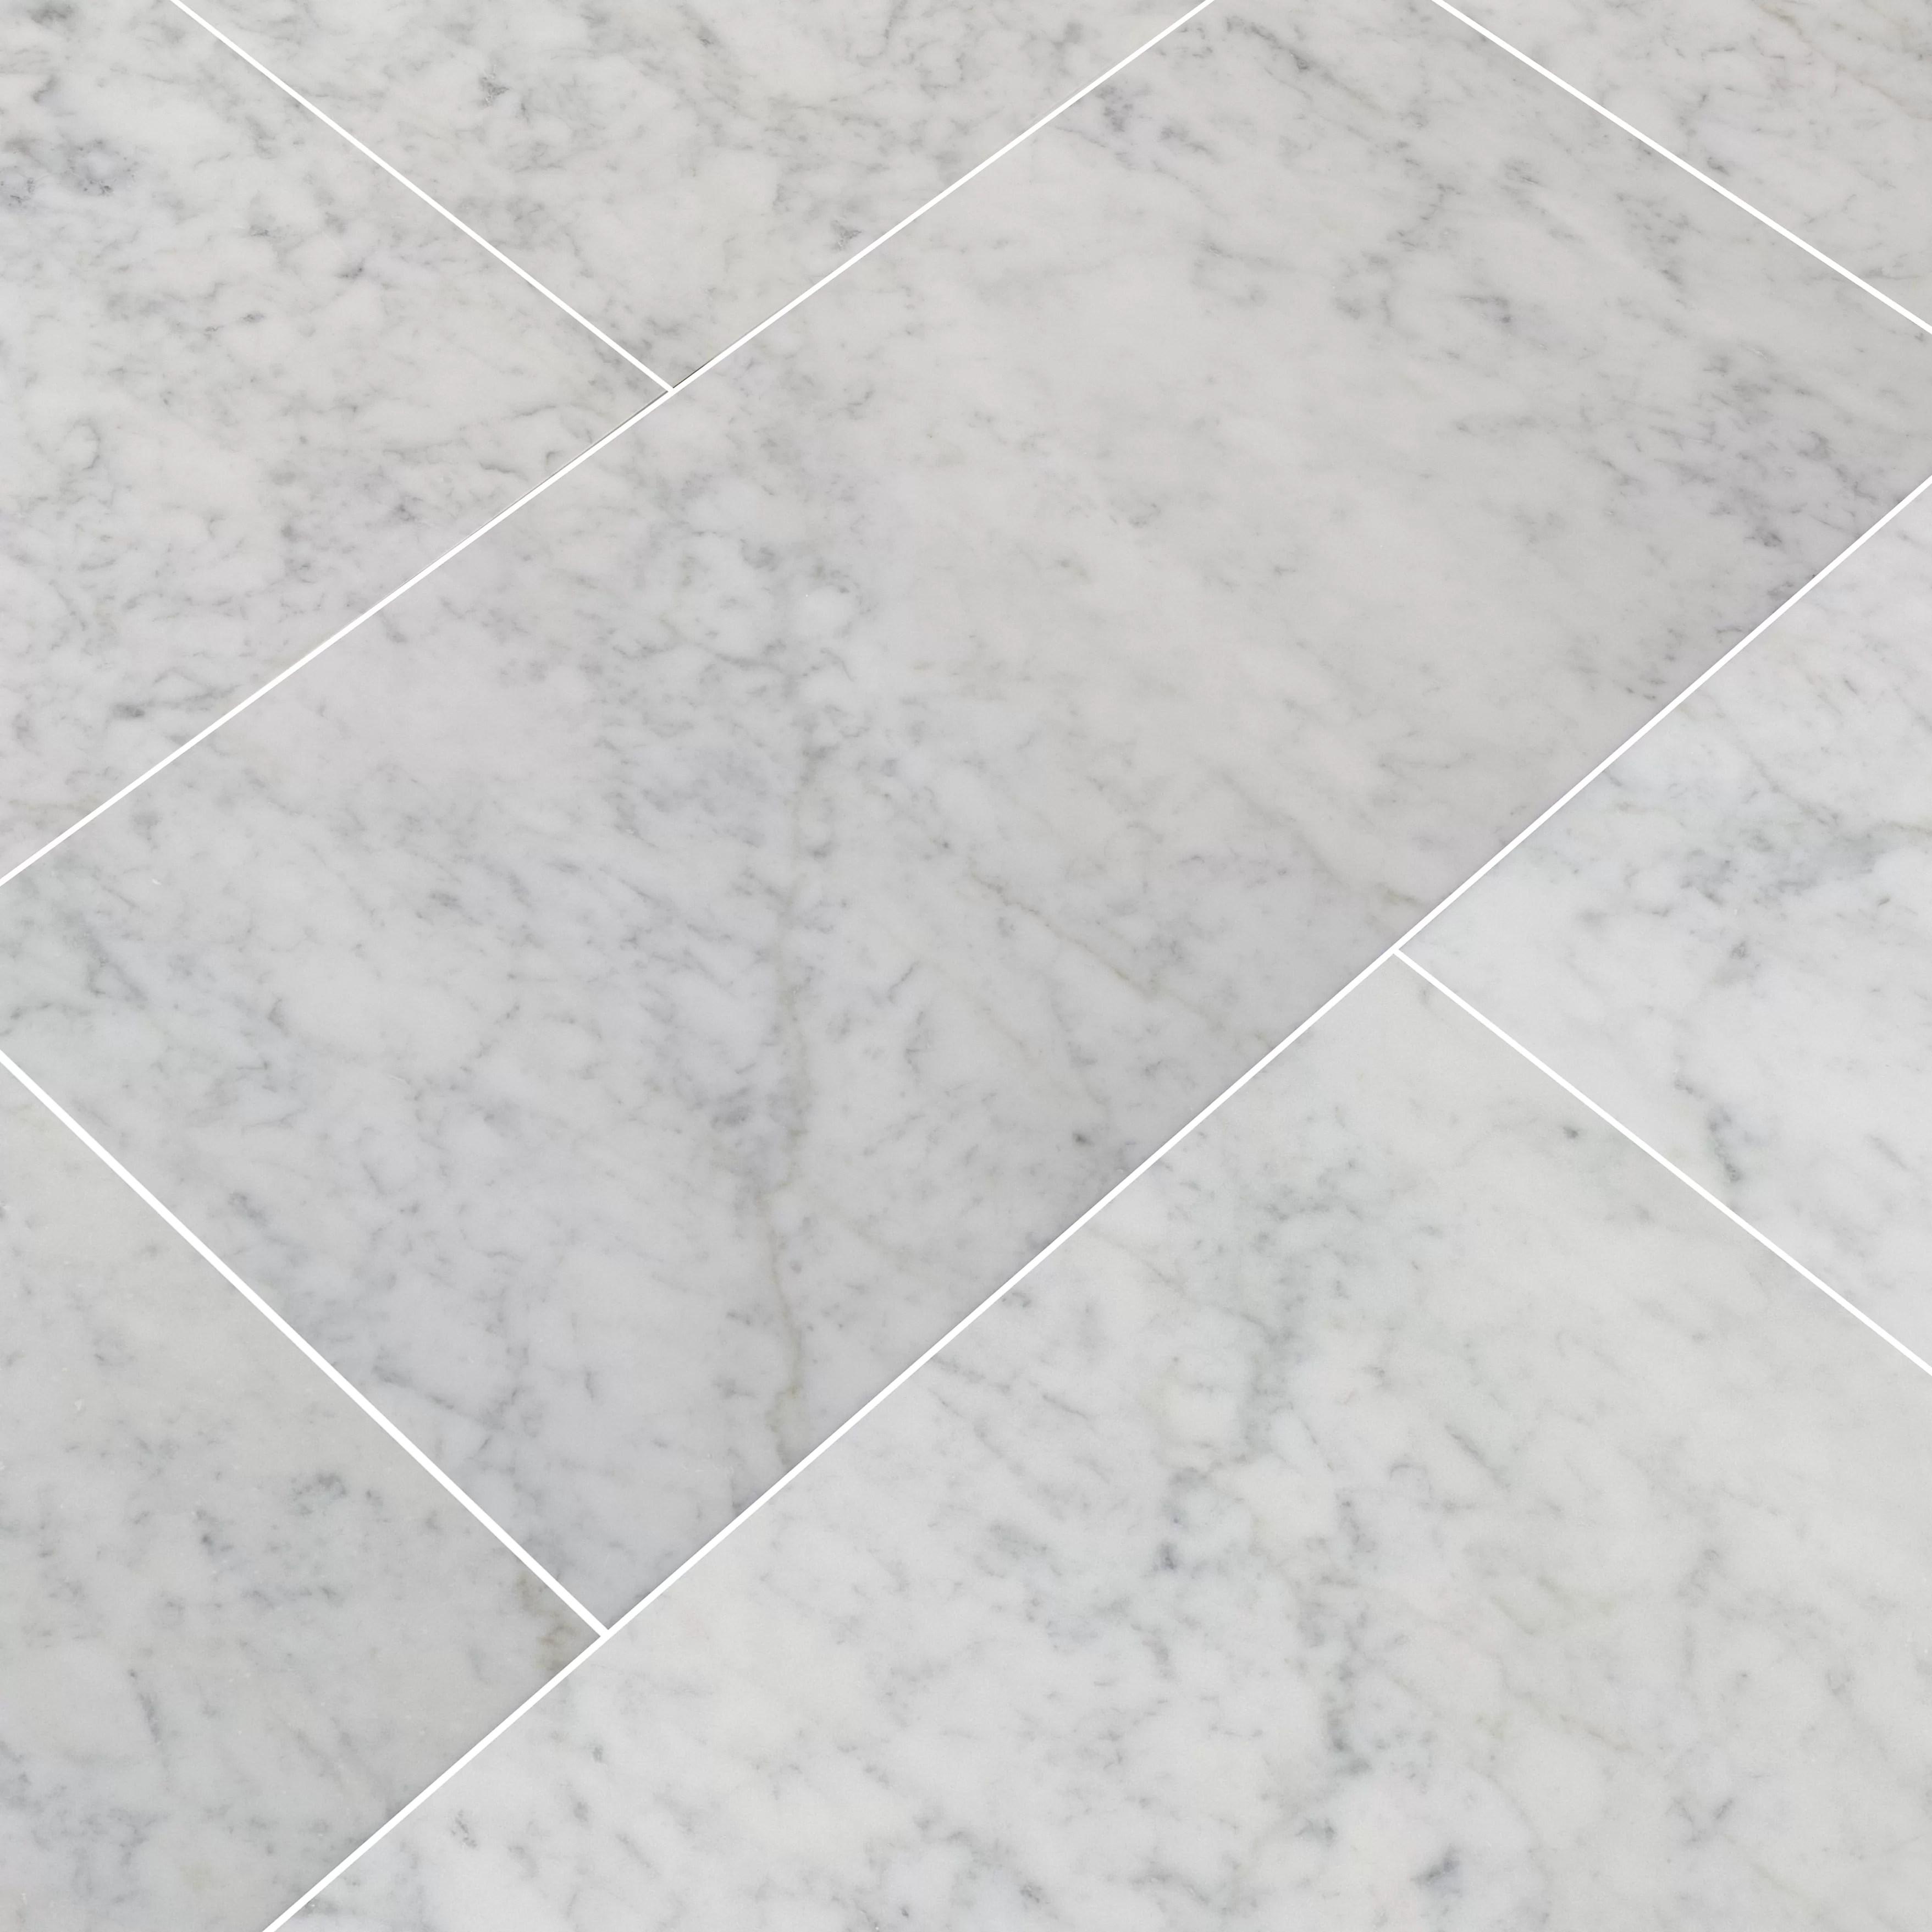 carrara 12 x 24 beveled natural stone marble look wall floor tile